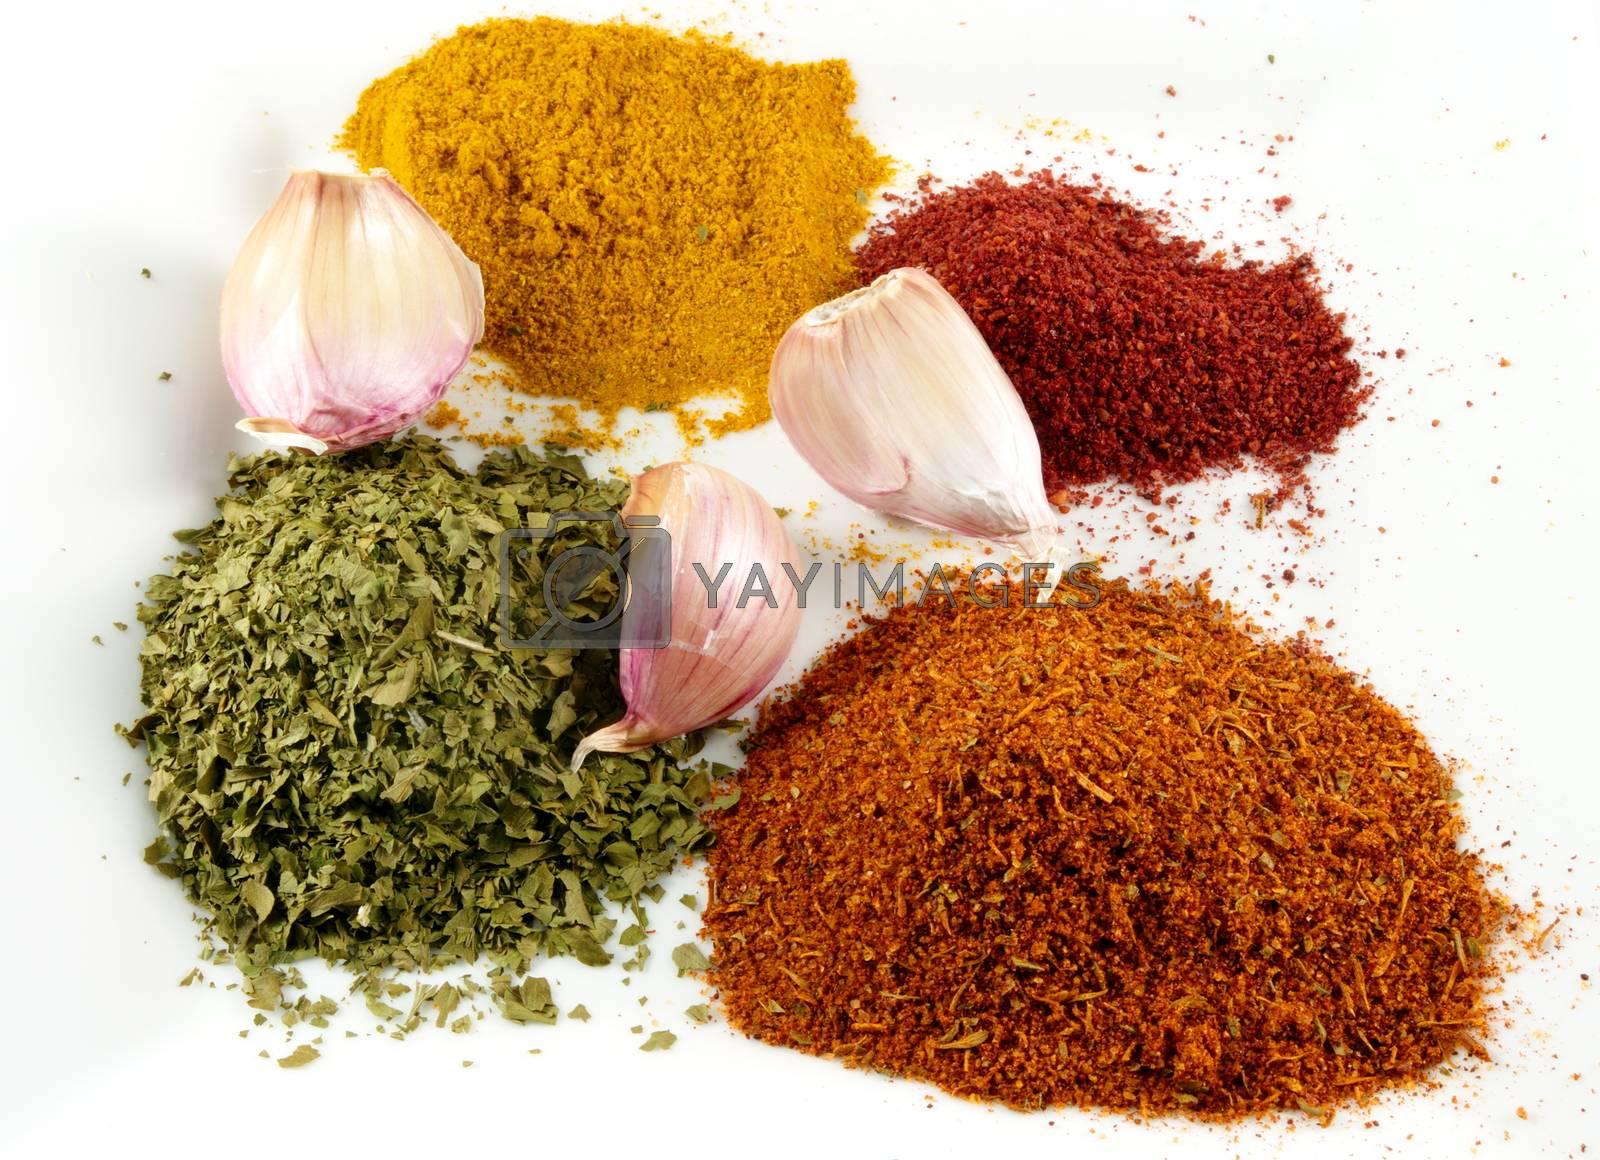 various spices with garlic closeup